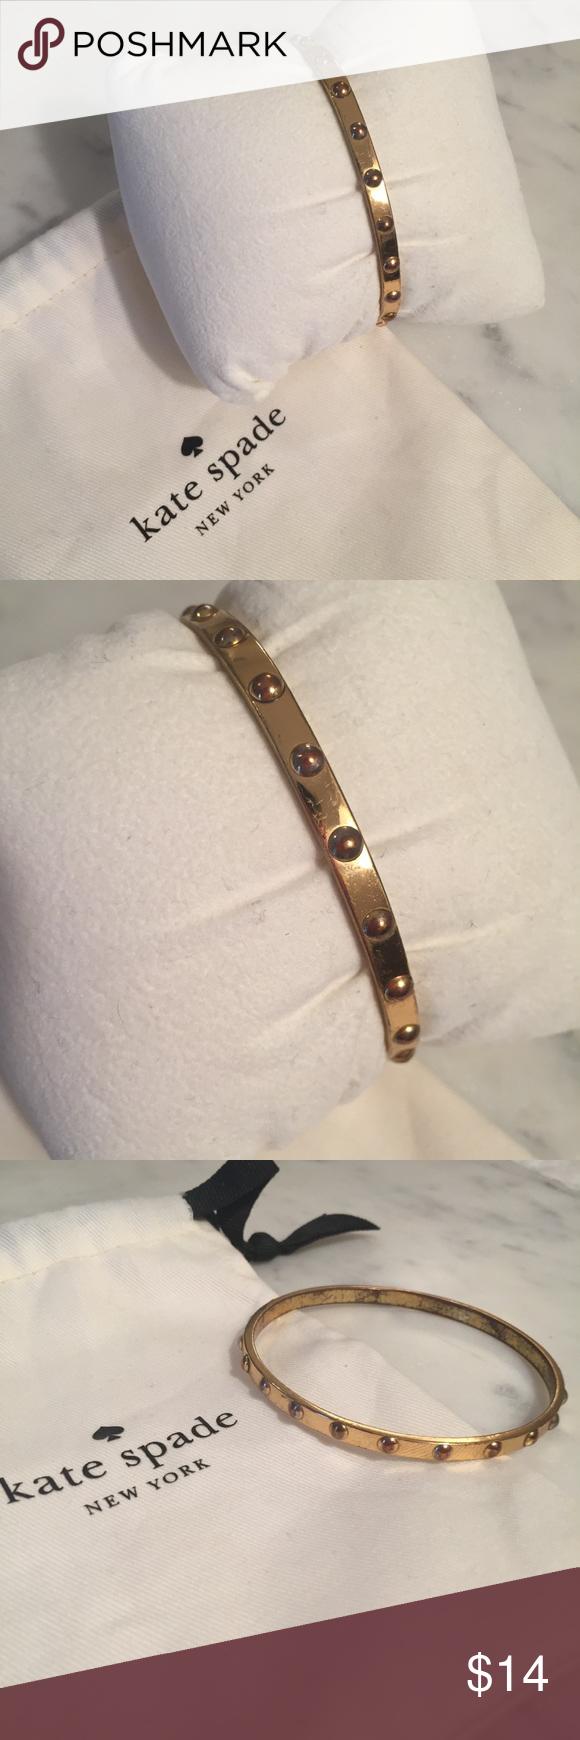 Kate spade gold grommet bangle bracelet trendy low price womenus